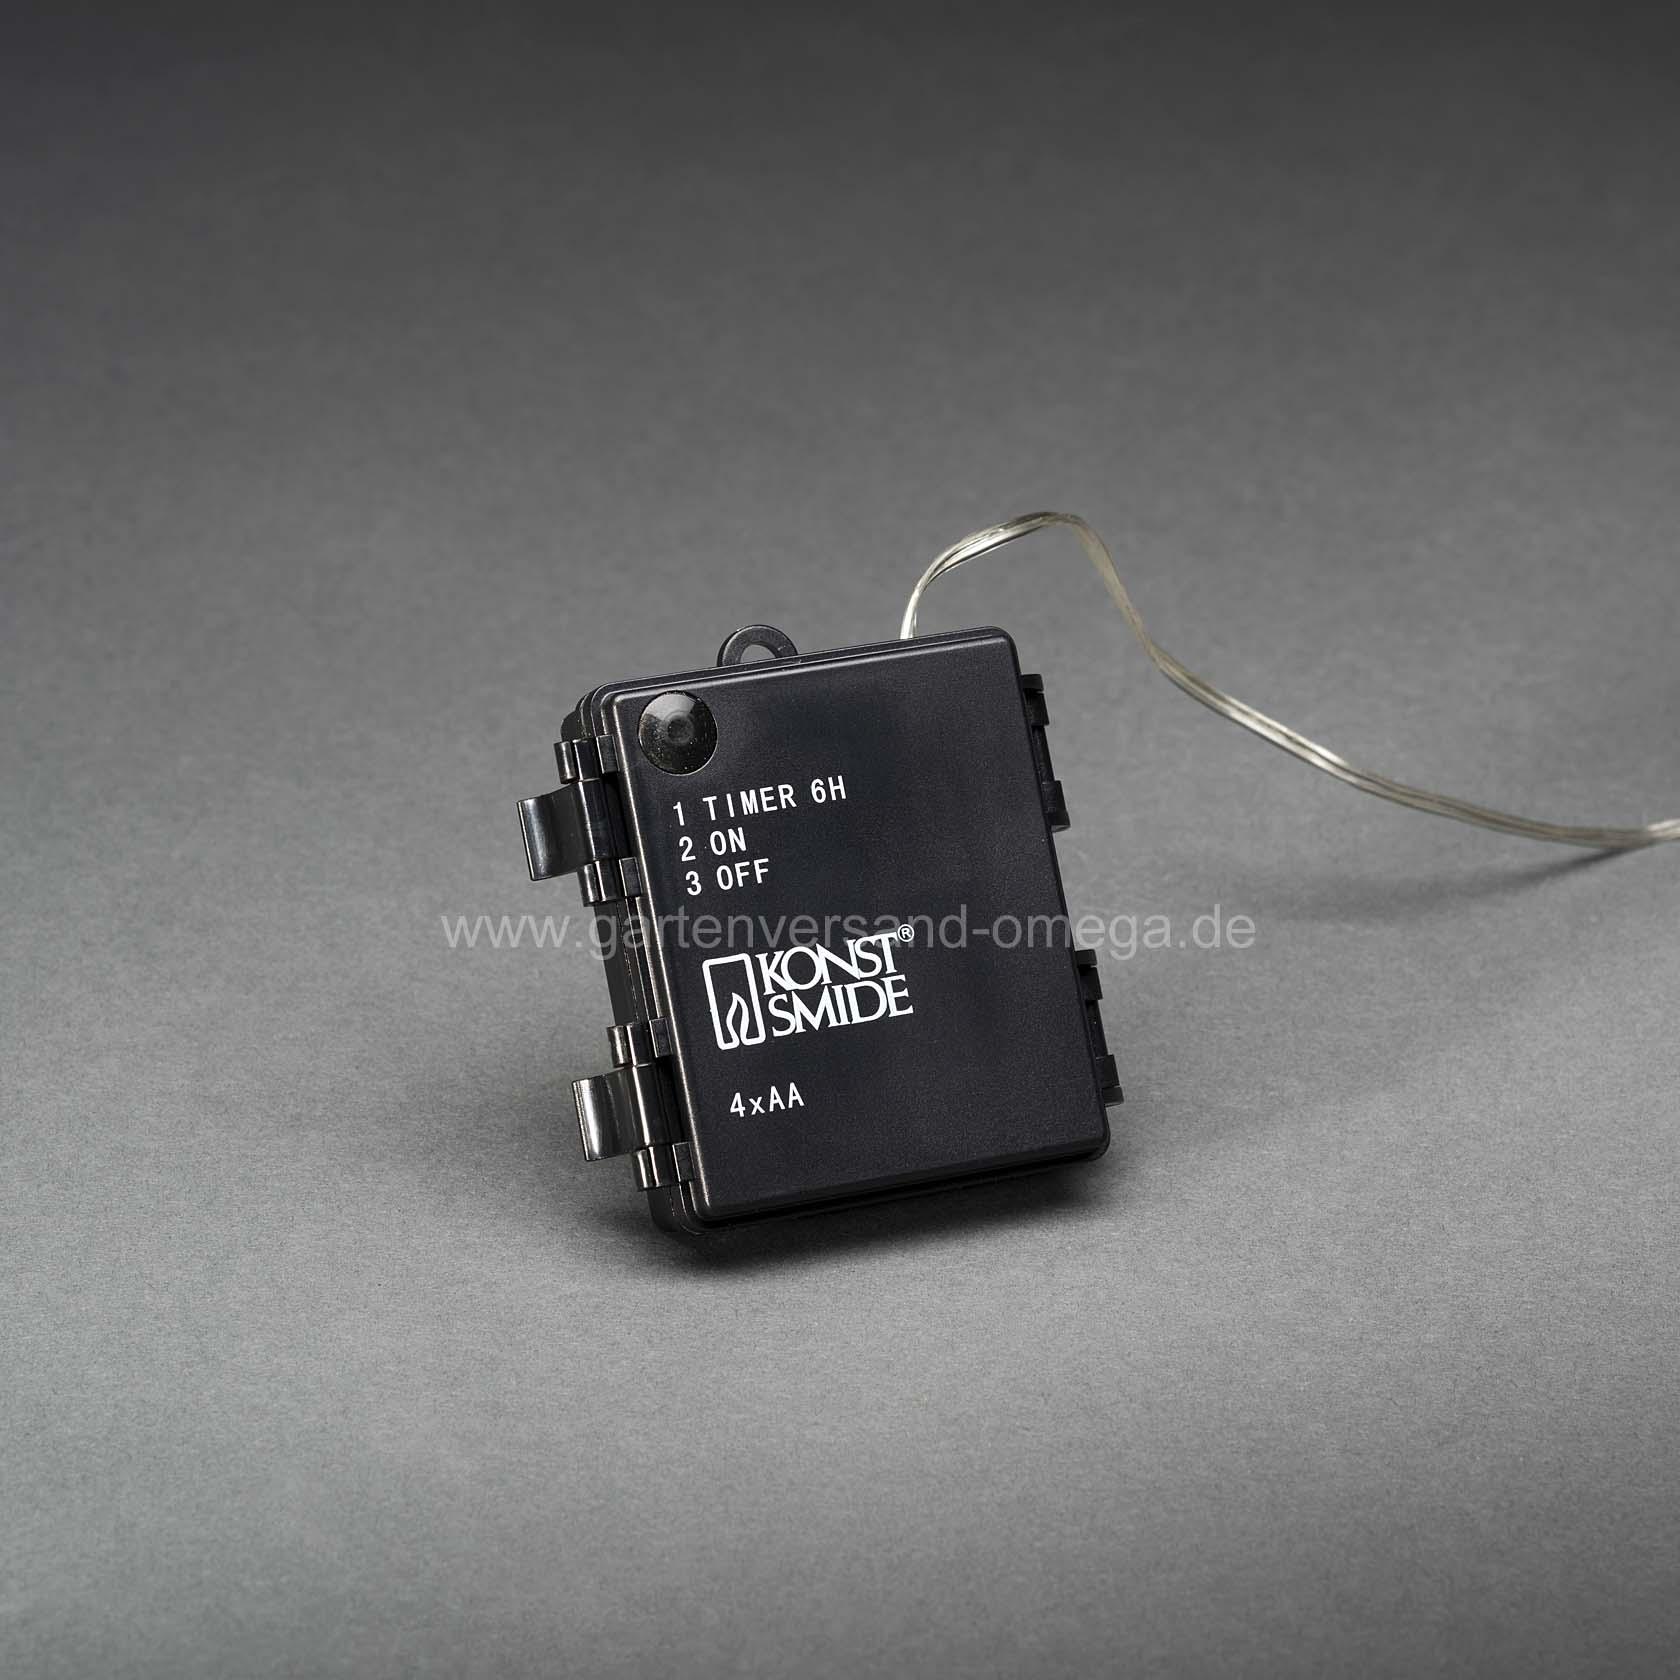 Batteriebetriebene led acryl schneeflocke acrylsilhouette weihnachtsbeleuchtung im garten - Weihnachtsbeleuchtung batterie ...